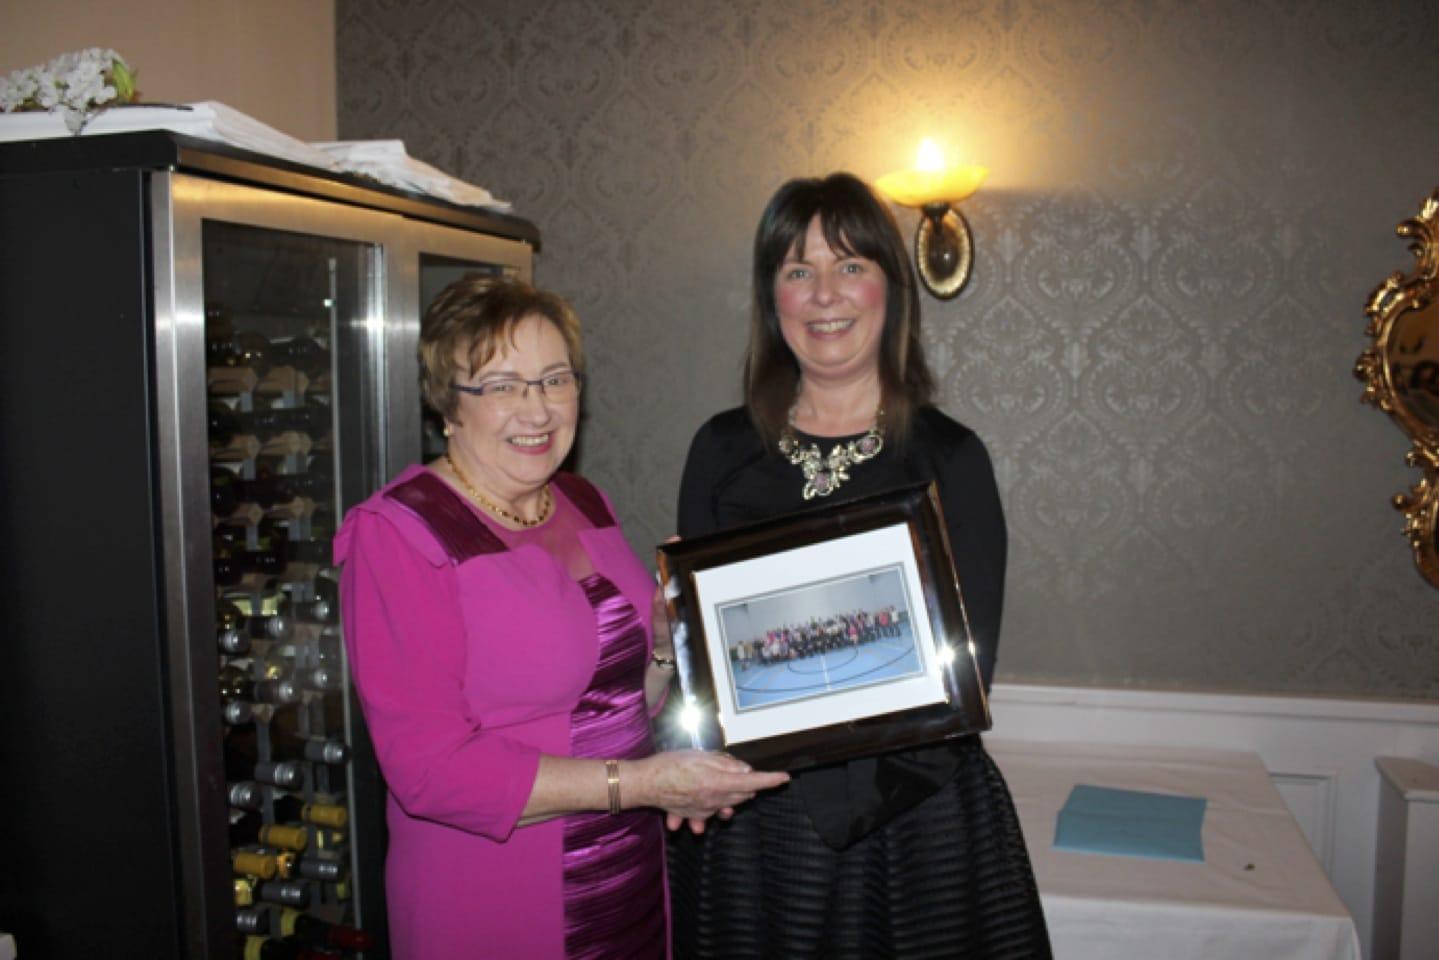 Deputy Principal Liz Cregan presented Carmel Harnett with a staff photo